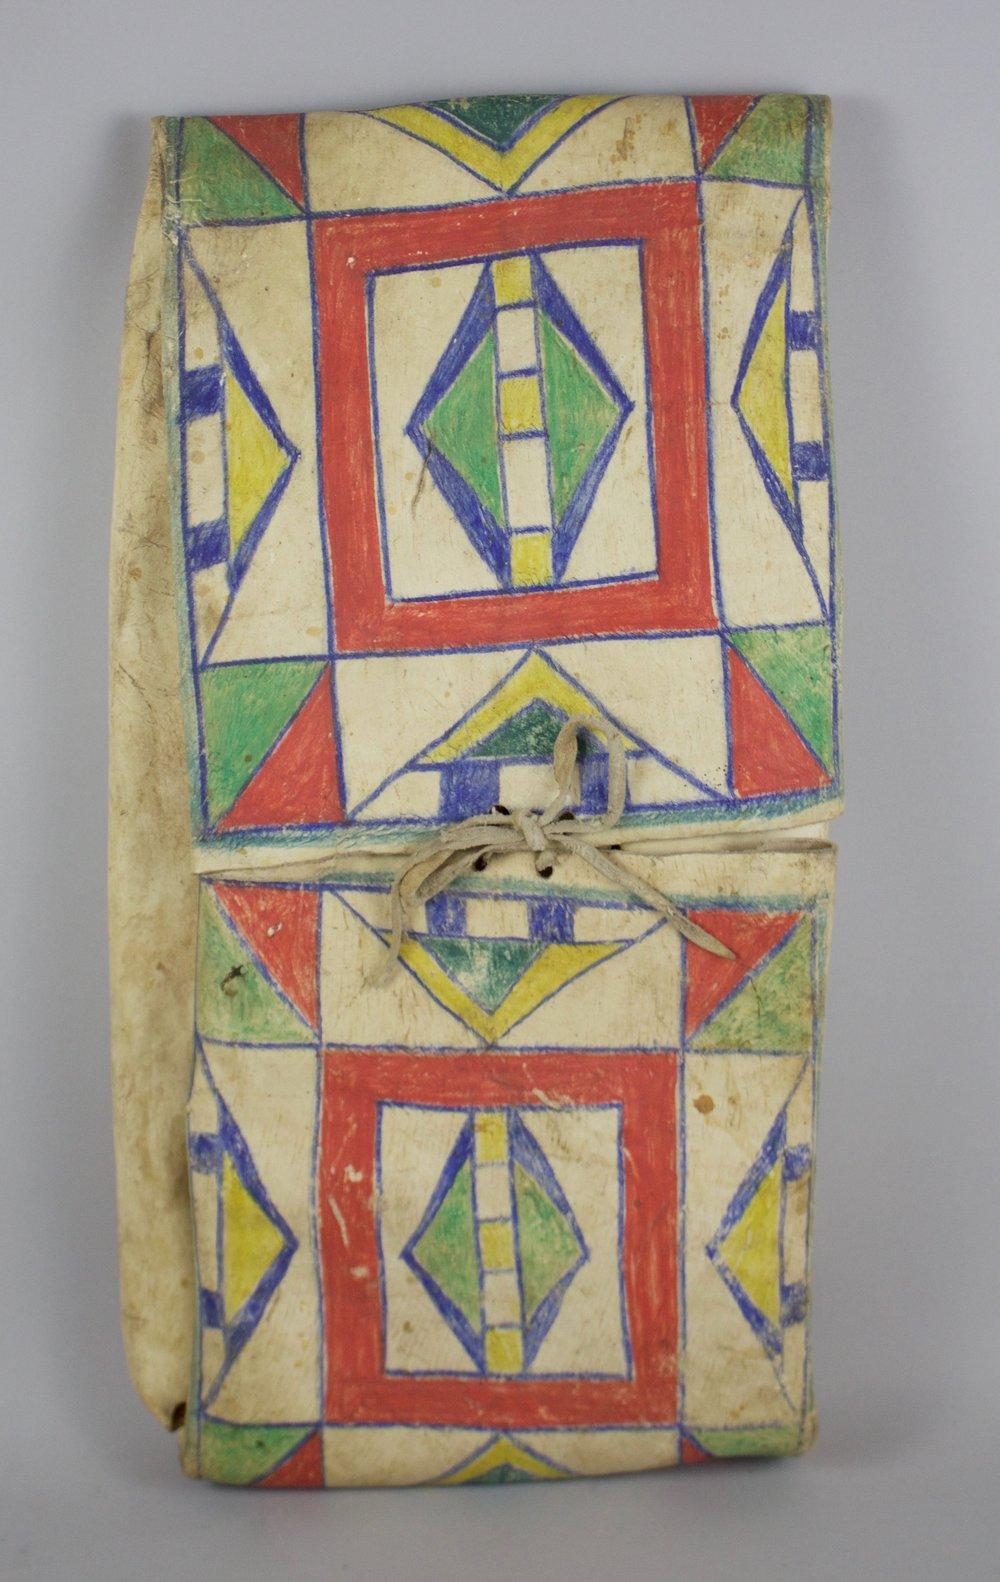 Nez Perce c.1890 DV0108